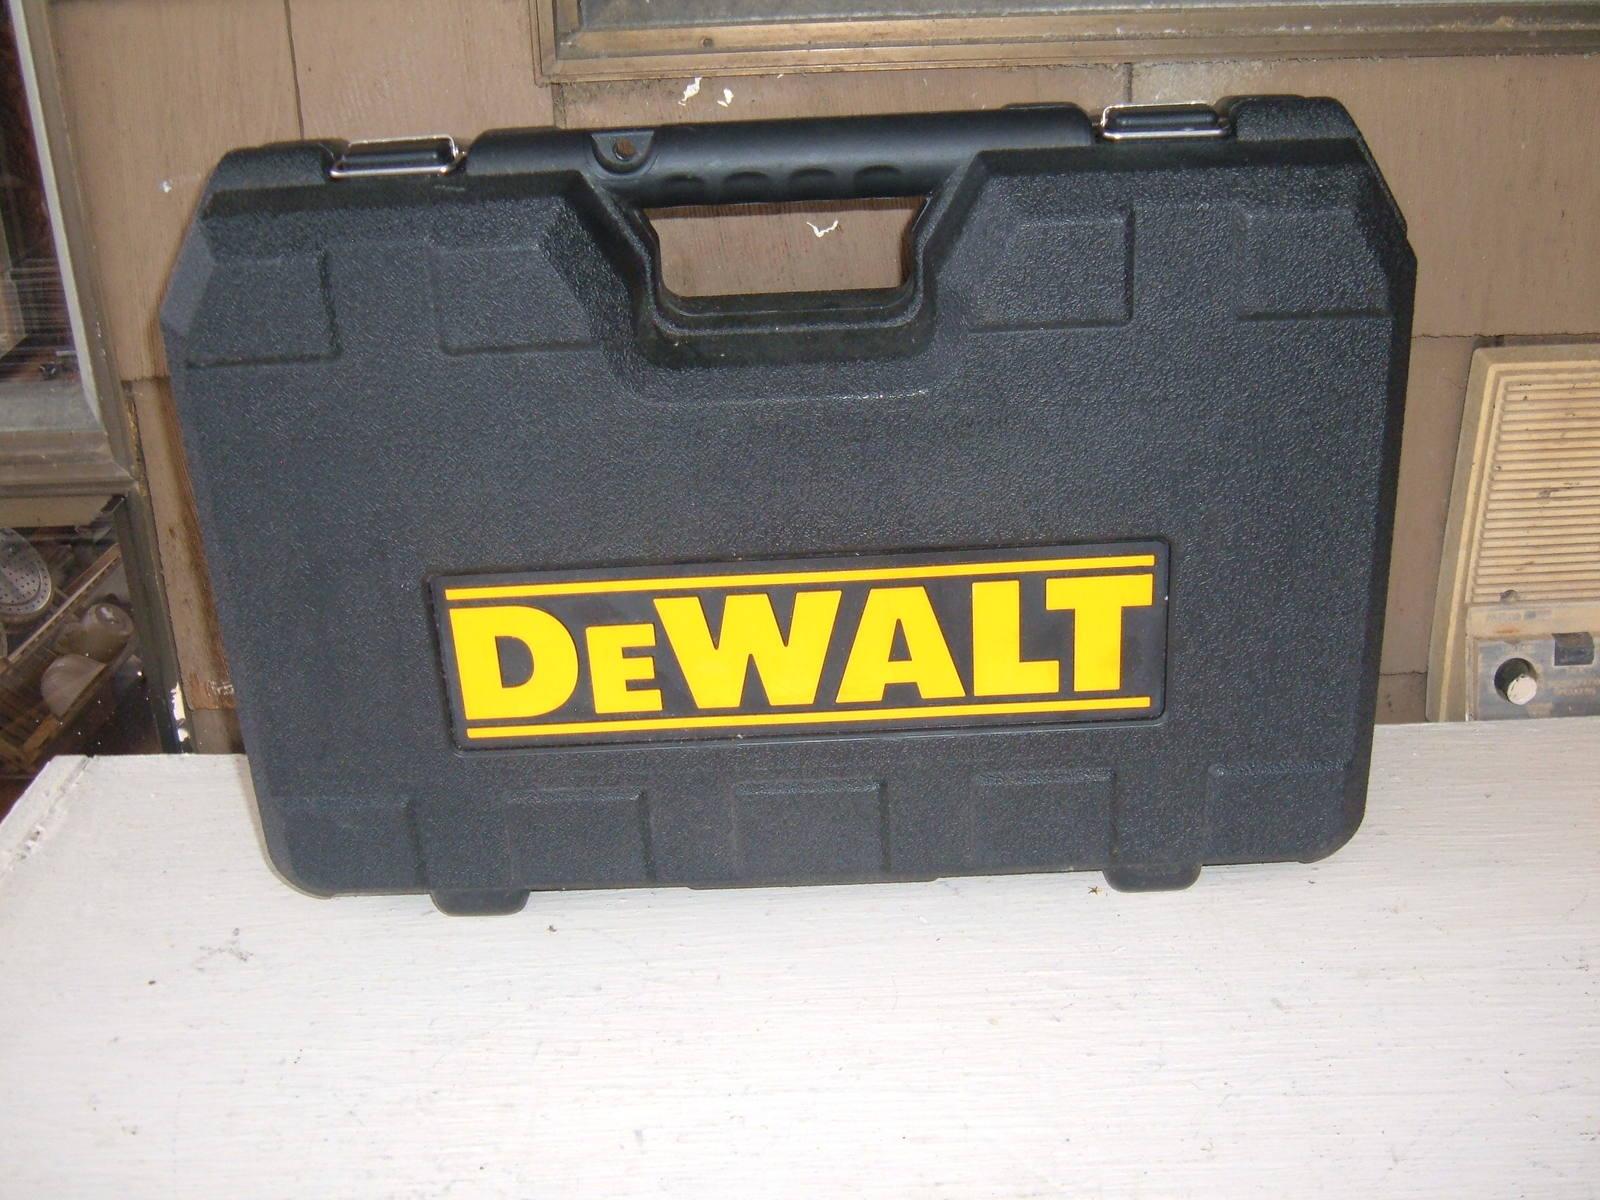 "DEWALT 18V DW960 3/8"" RIGHT ANGLE DRILL KIT WITH DC9096 BATT, DW9116 CHGR & CASE - $179.00"